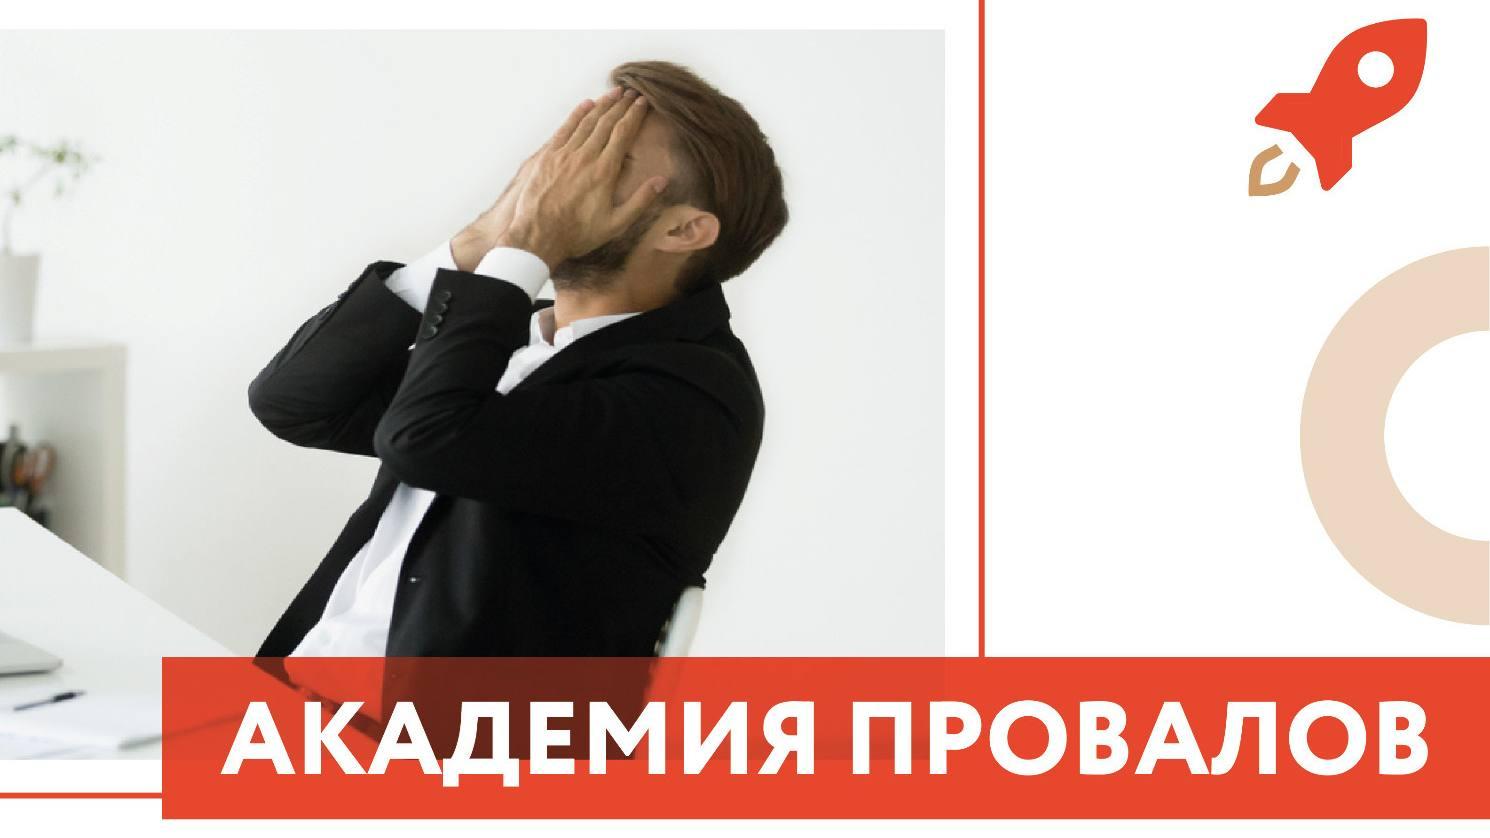 Бизнес-программа «Академия провалов»